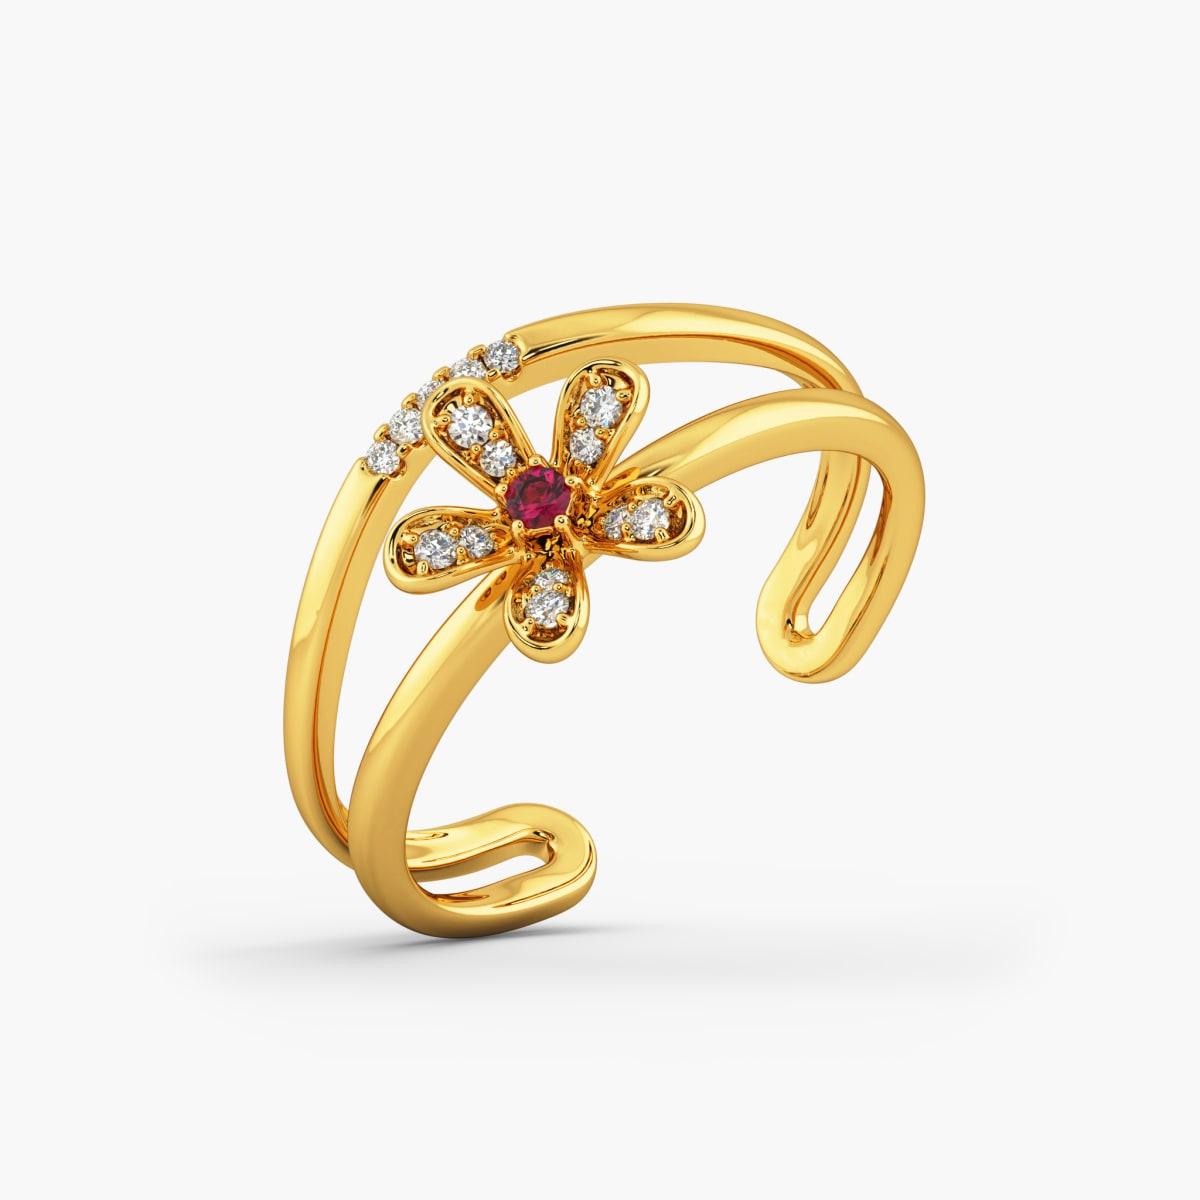 Designer Cz Gold Ring 5